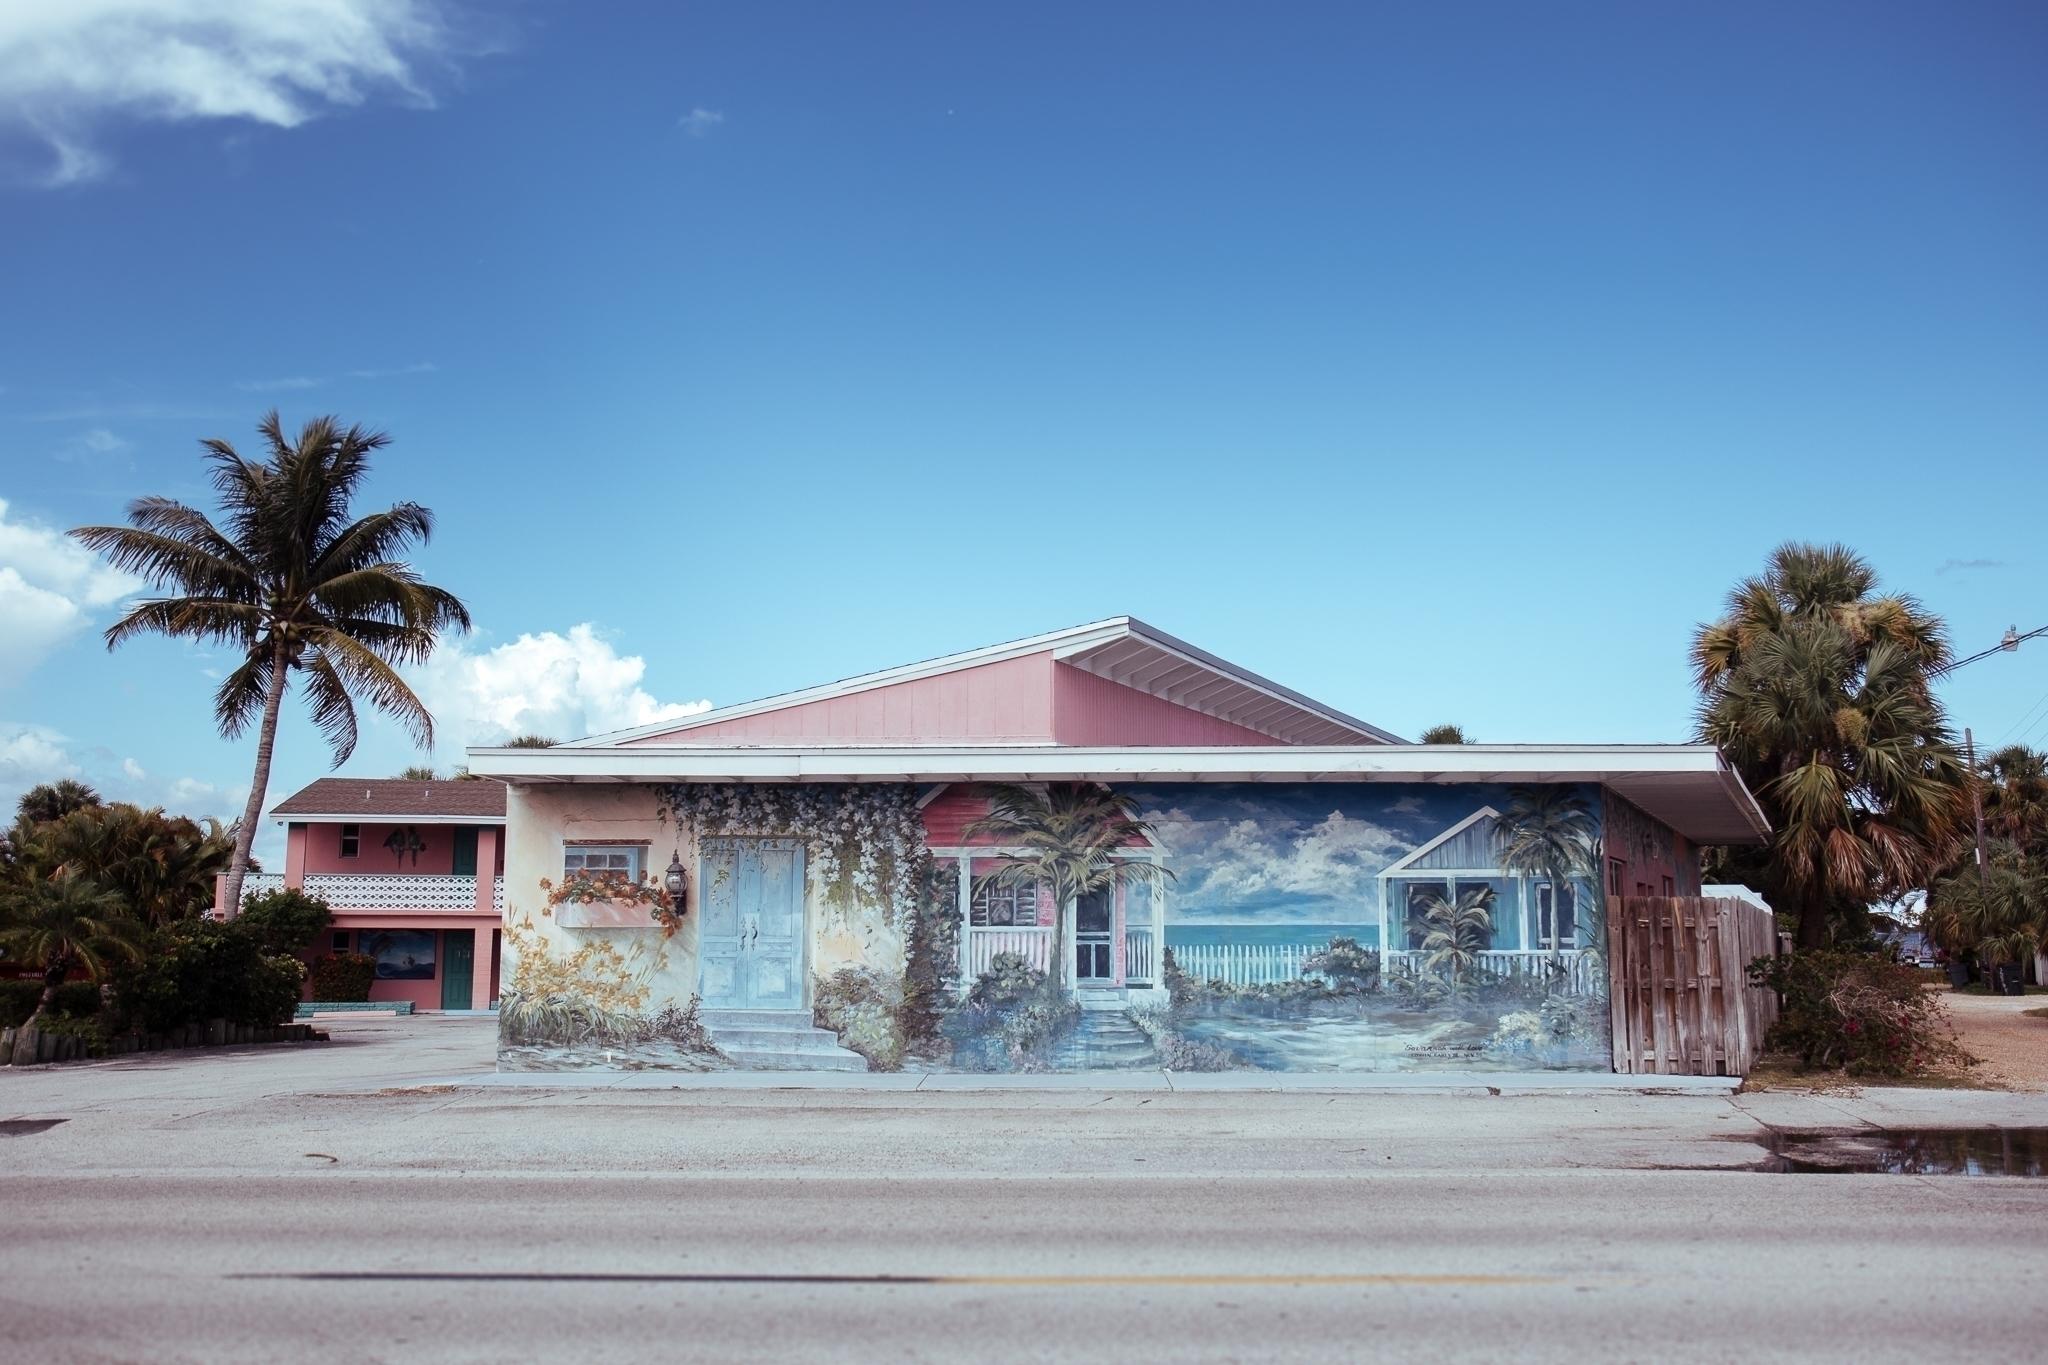 Wall art Felix Padrosa  - photography - felixpadrosa | ello